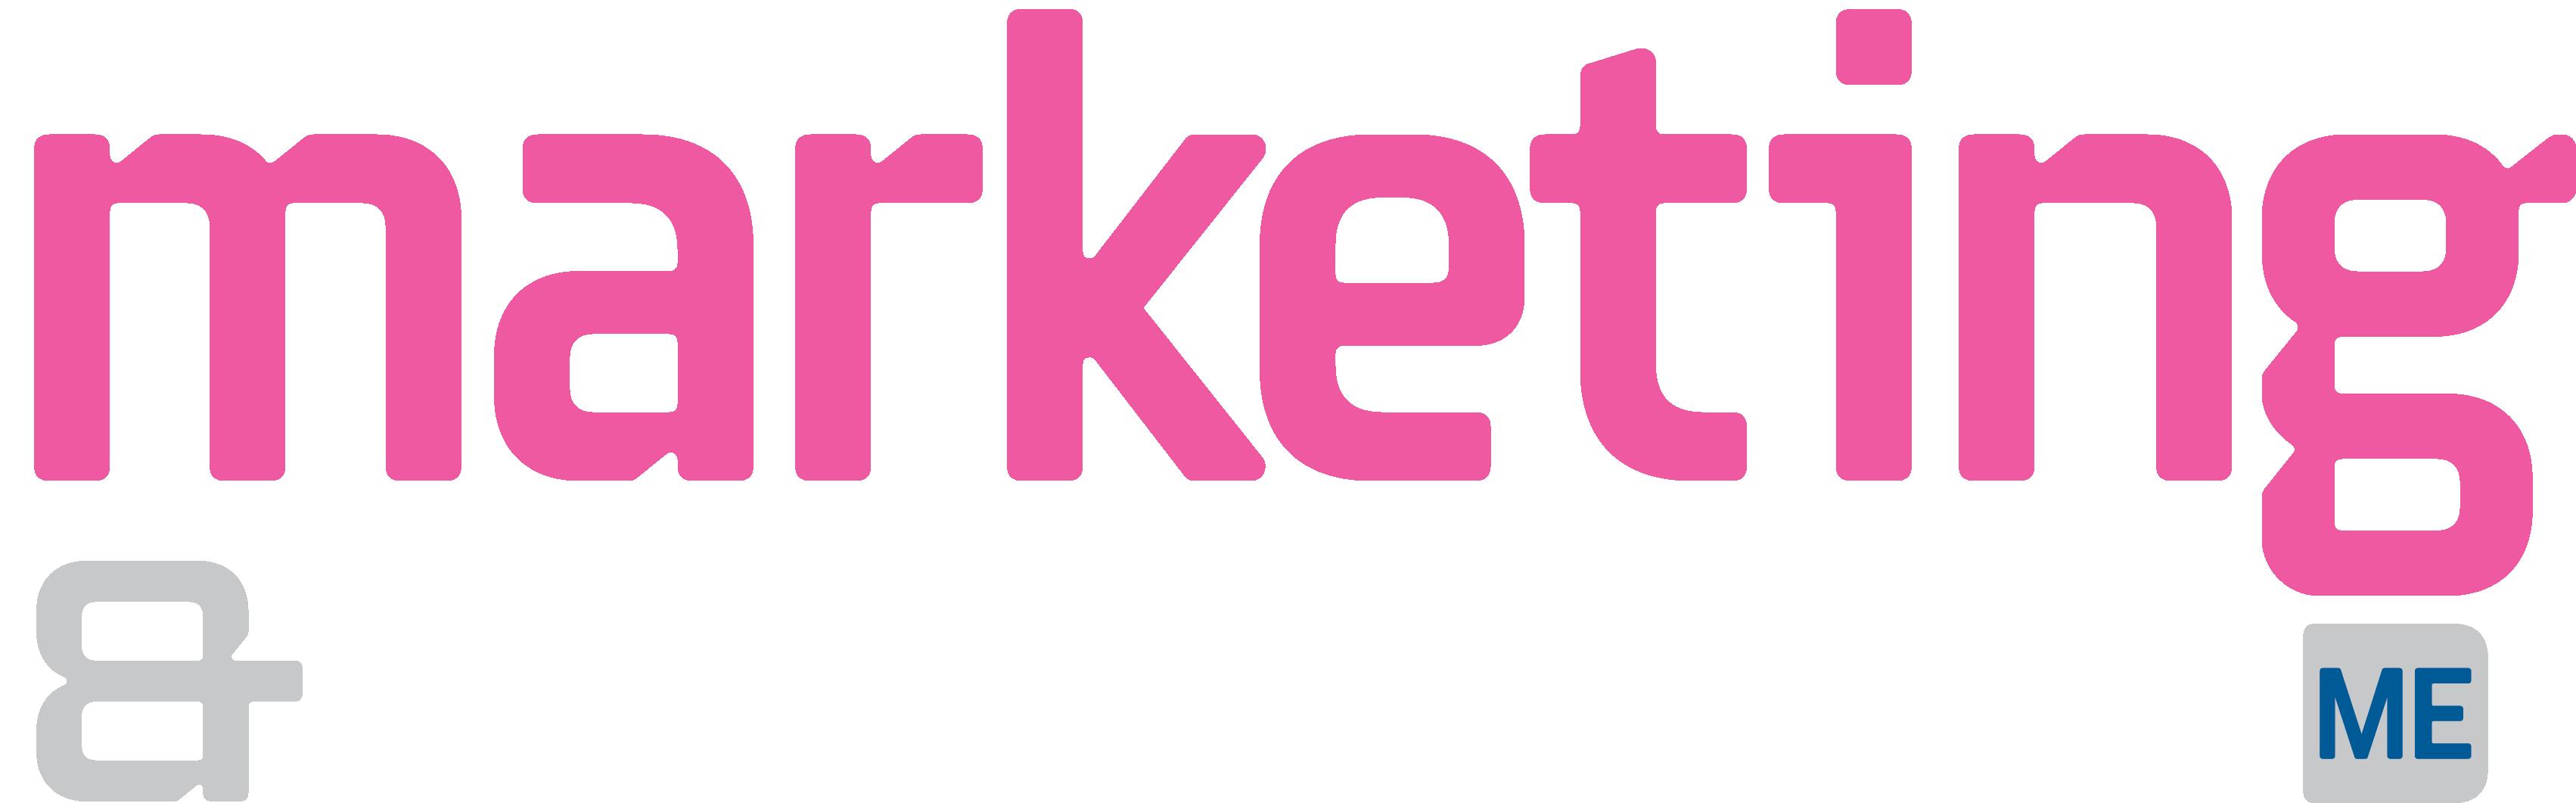 Marketing & Sales Show